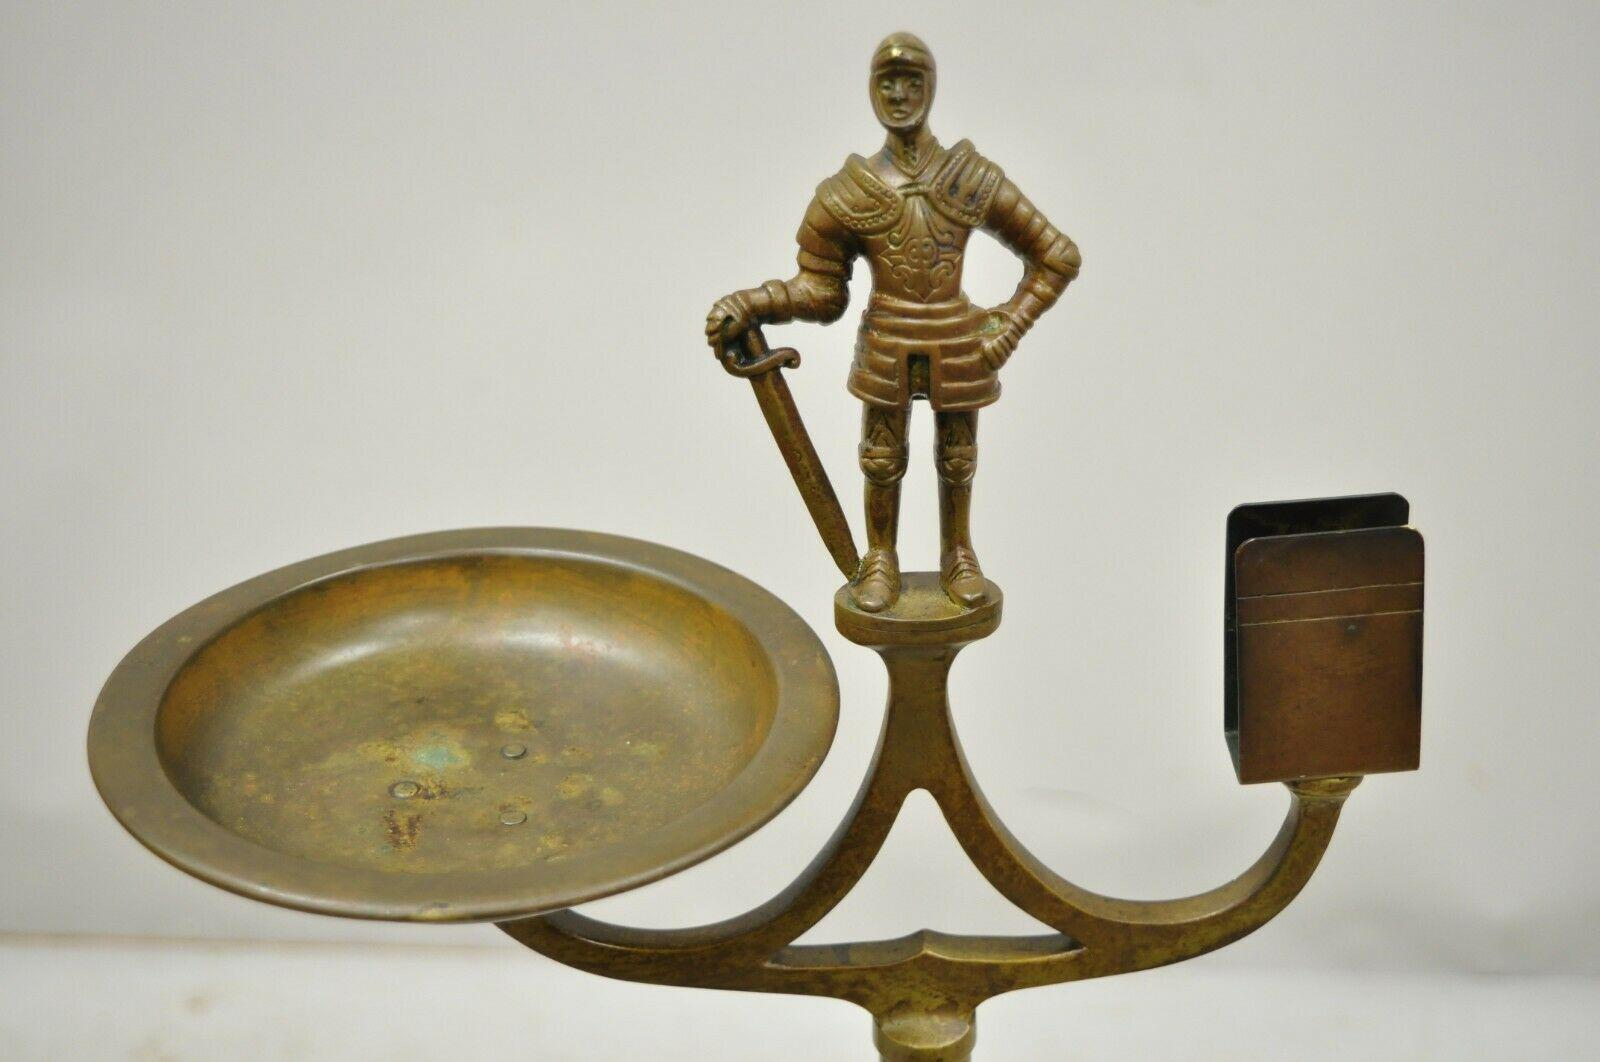 Brass Figural Tabletop Ashtray